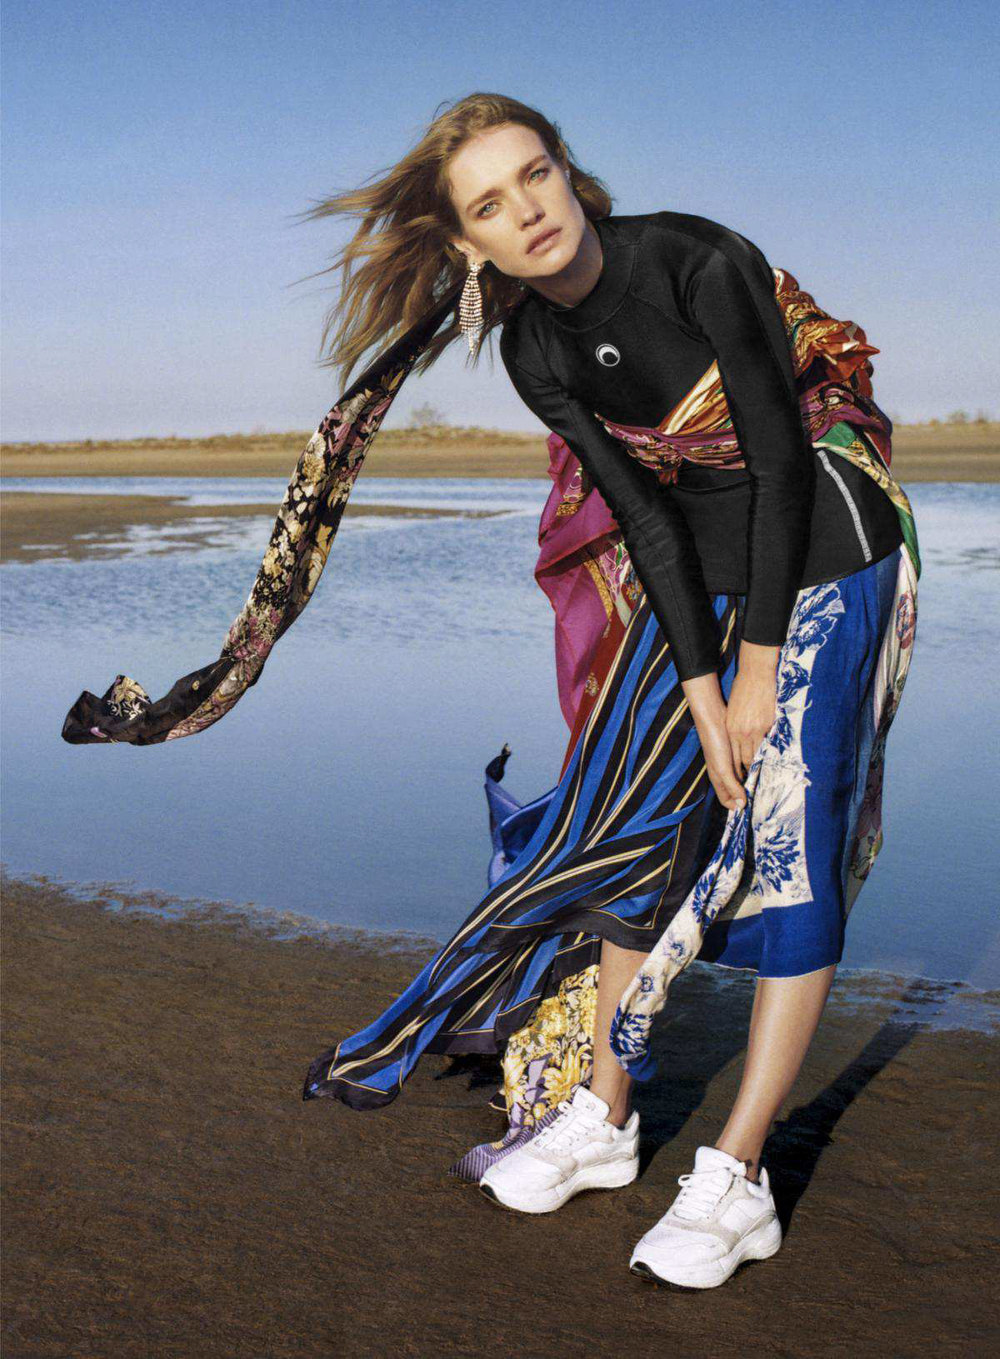 Natalia Vodianova by Zoe Ghertner for Vogue US July 2018 (9).jpg